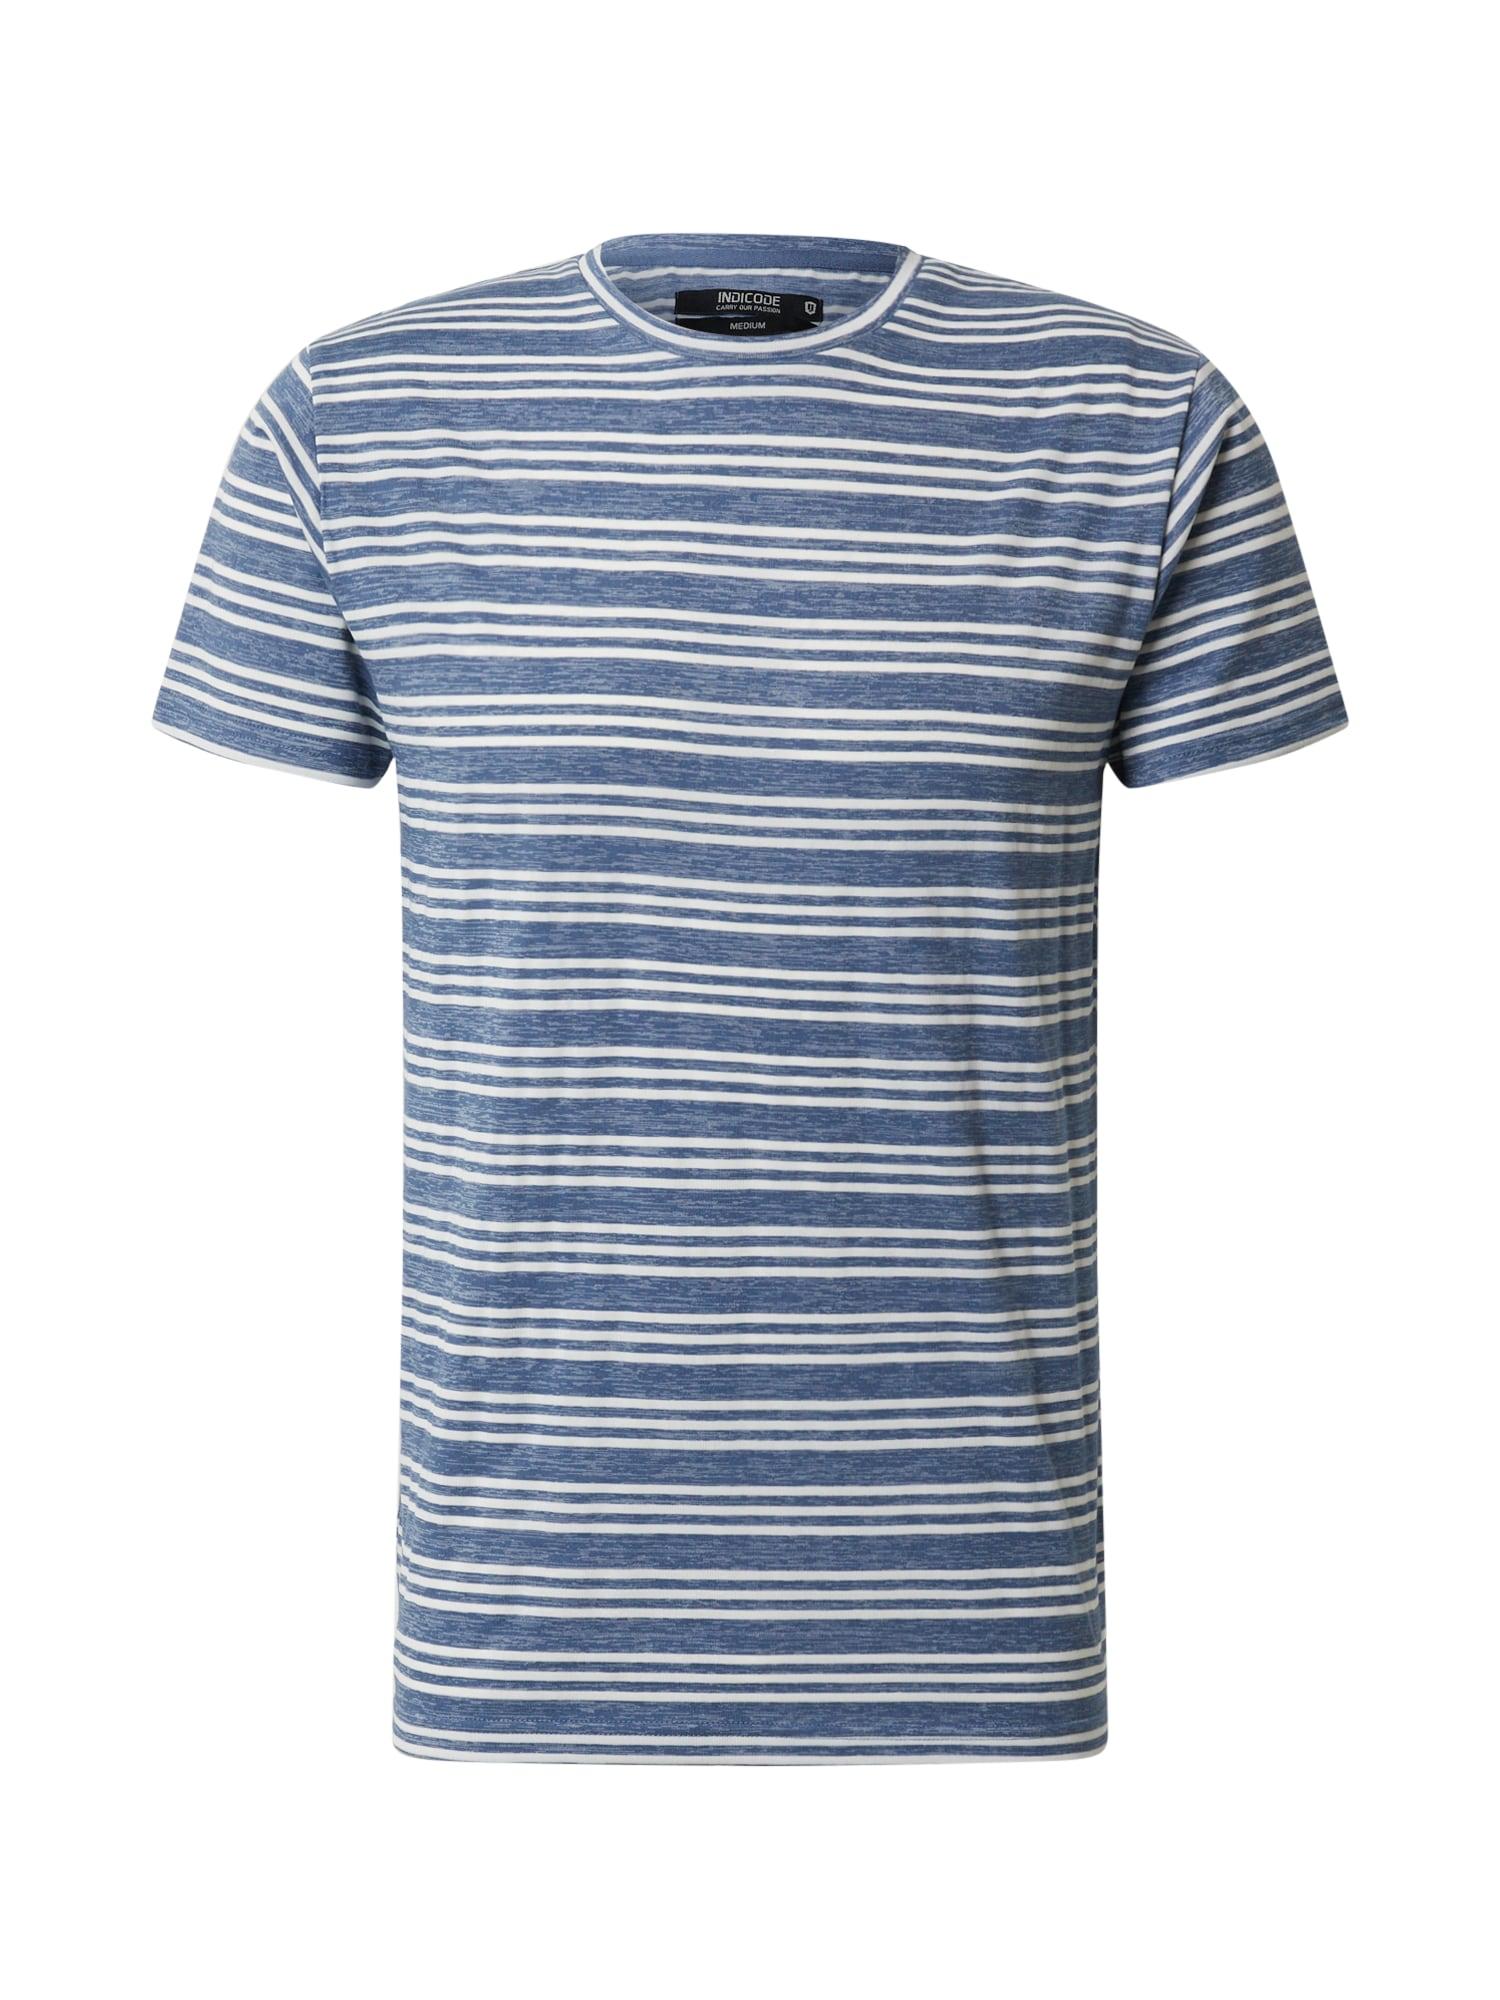 INDICODE JEANS Marškinėliai 'Lille' mėlyna